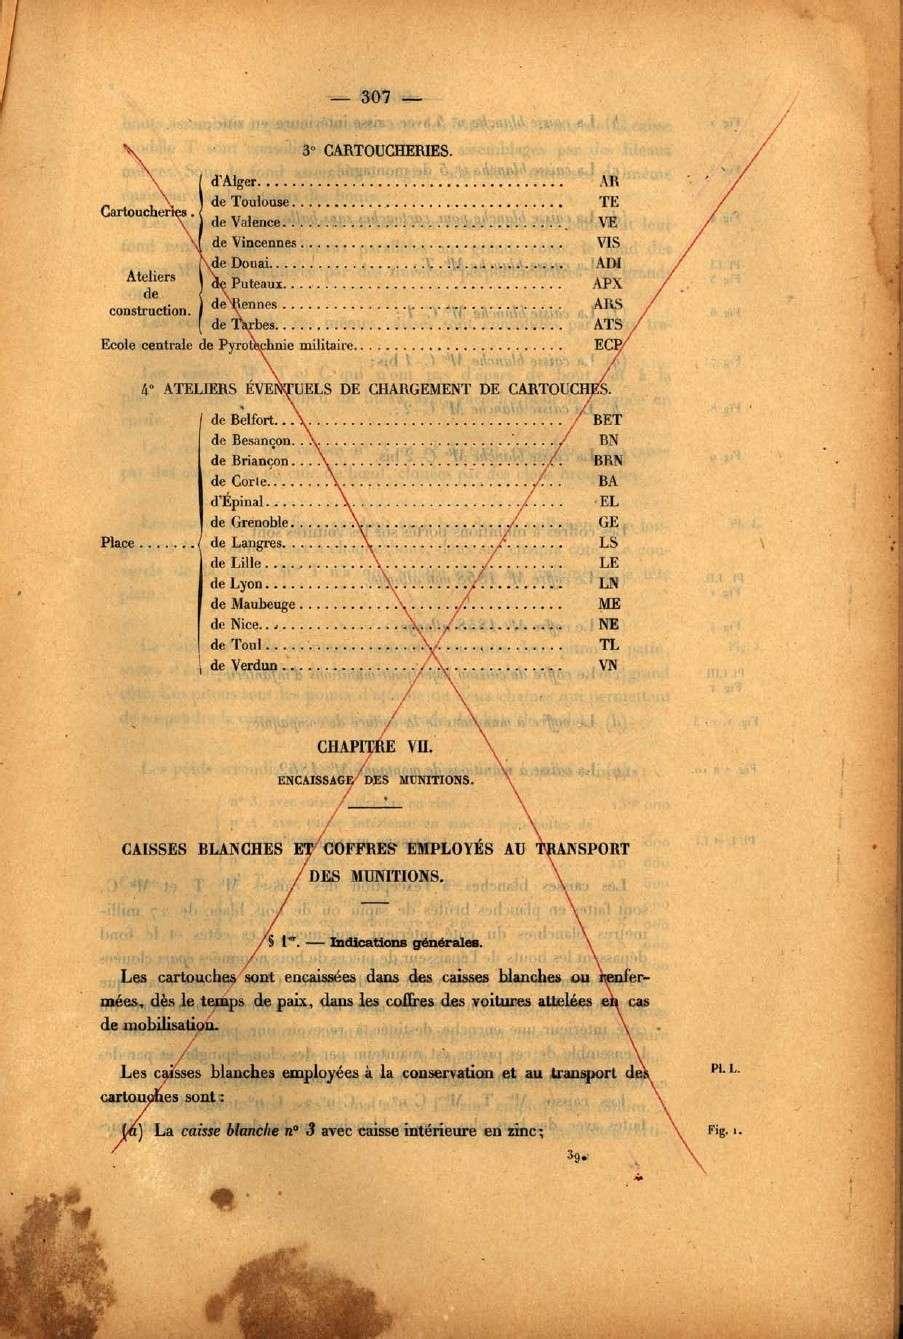 ABREVIATIONS MUNITIONS FRANCAISES 303-1e10